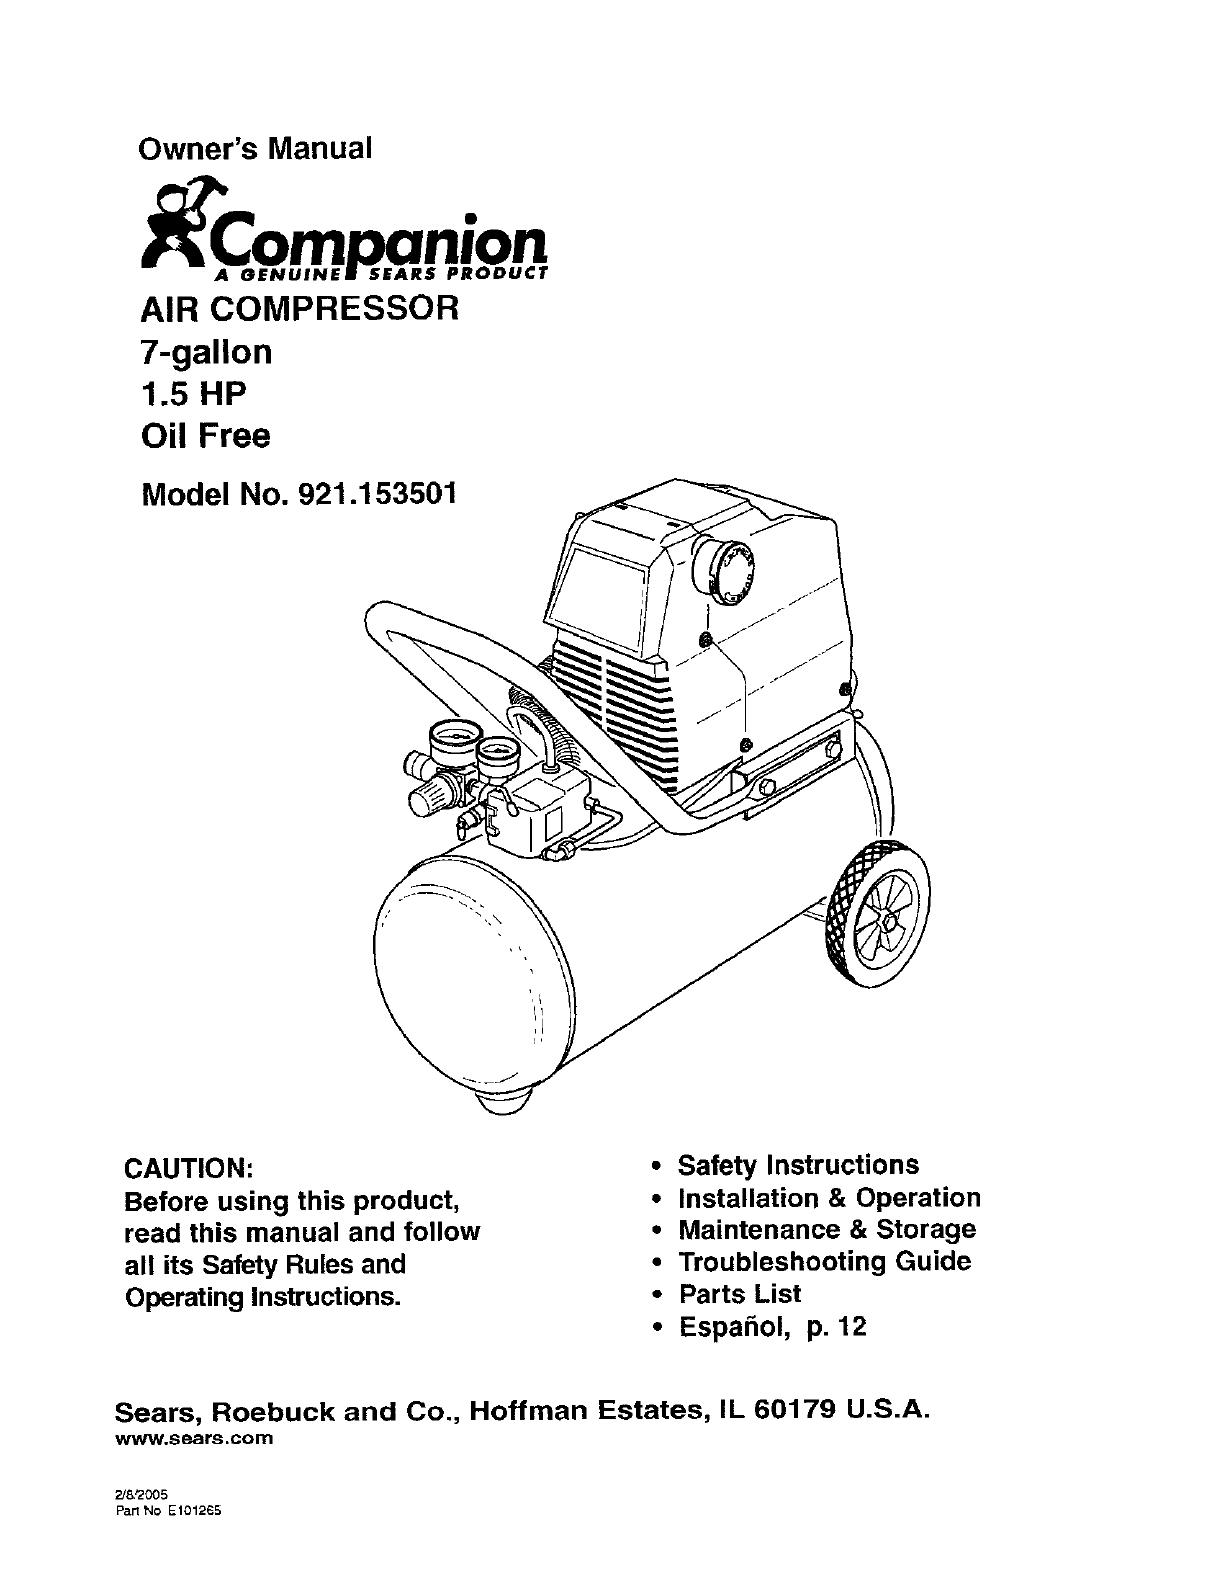 Companion 921153501 User Manual Air Compressor Manuals And Guides L0505102